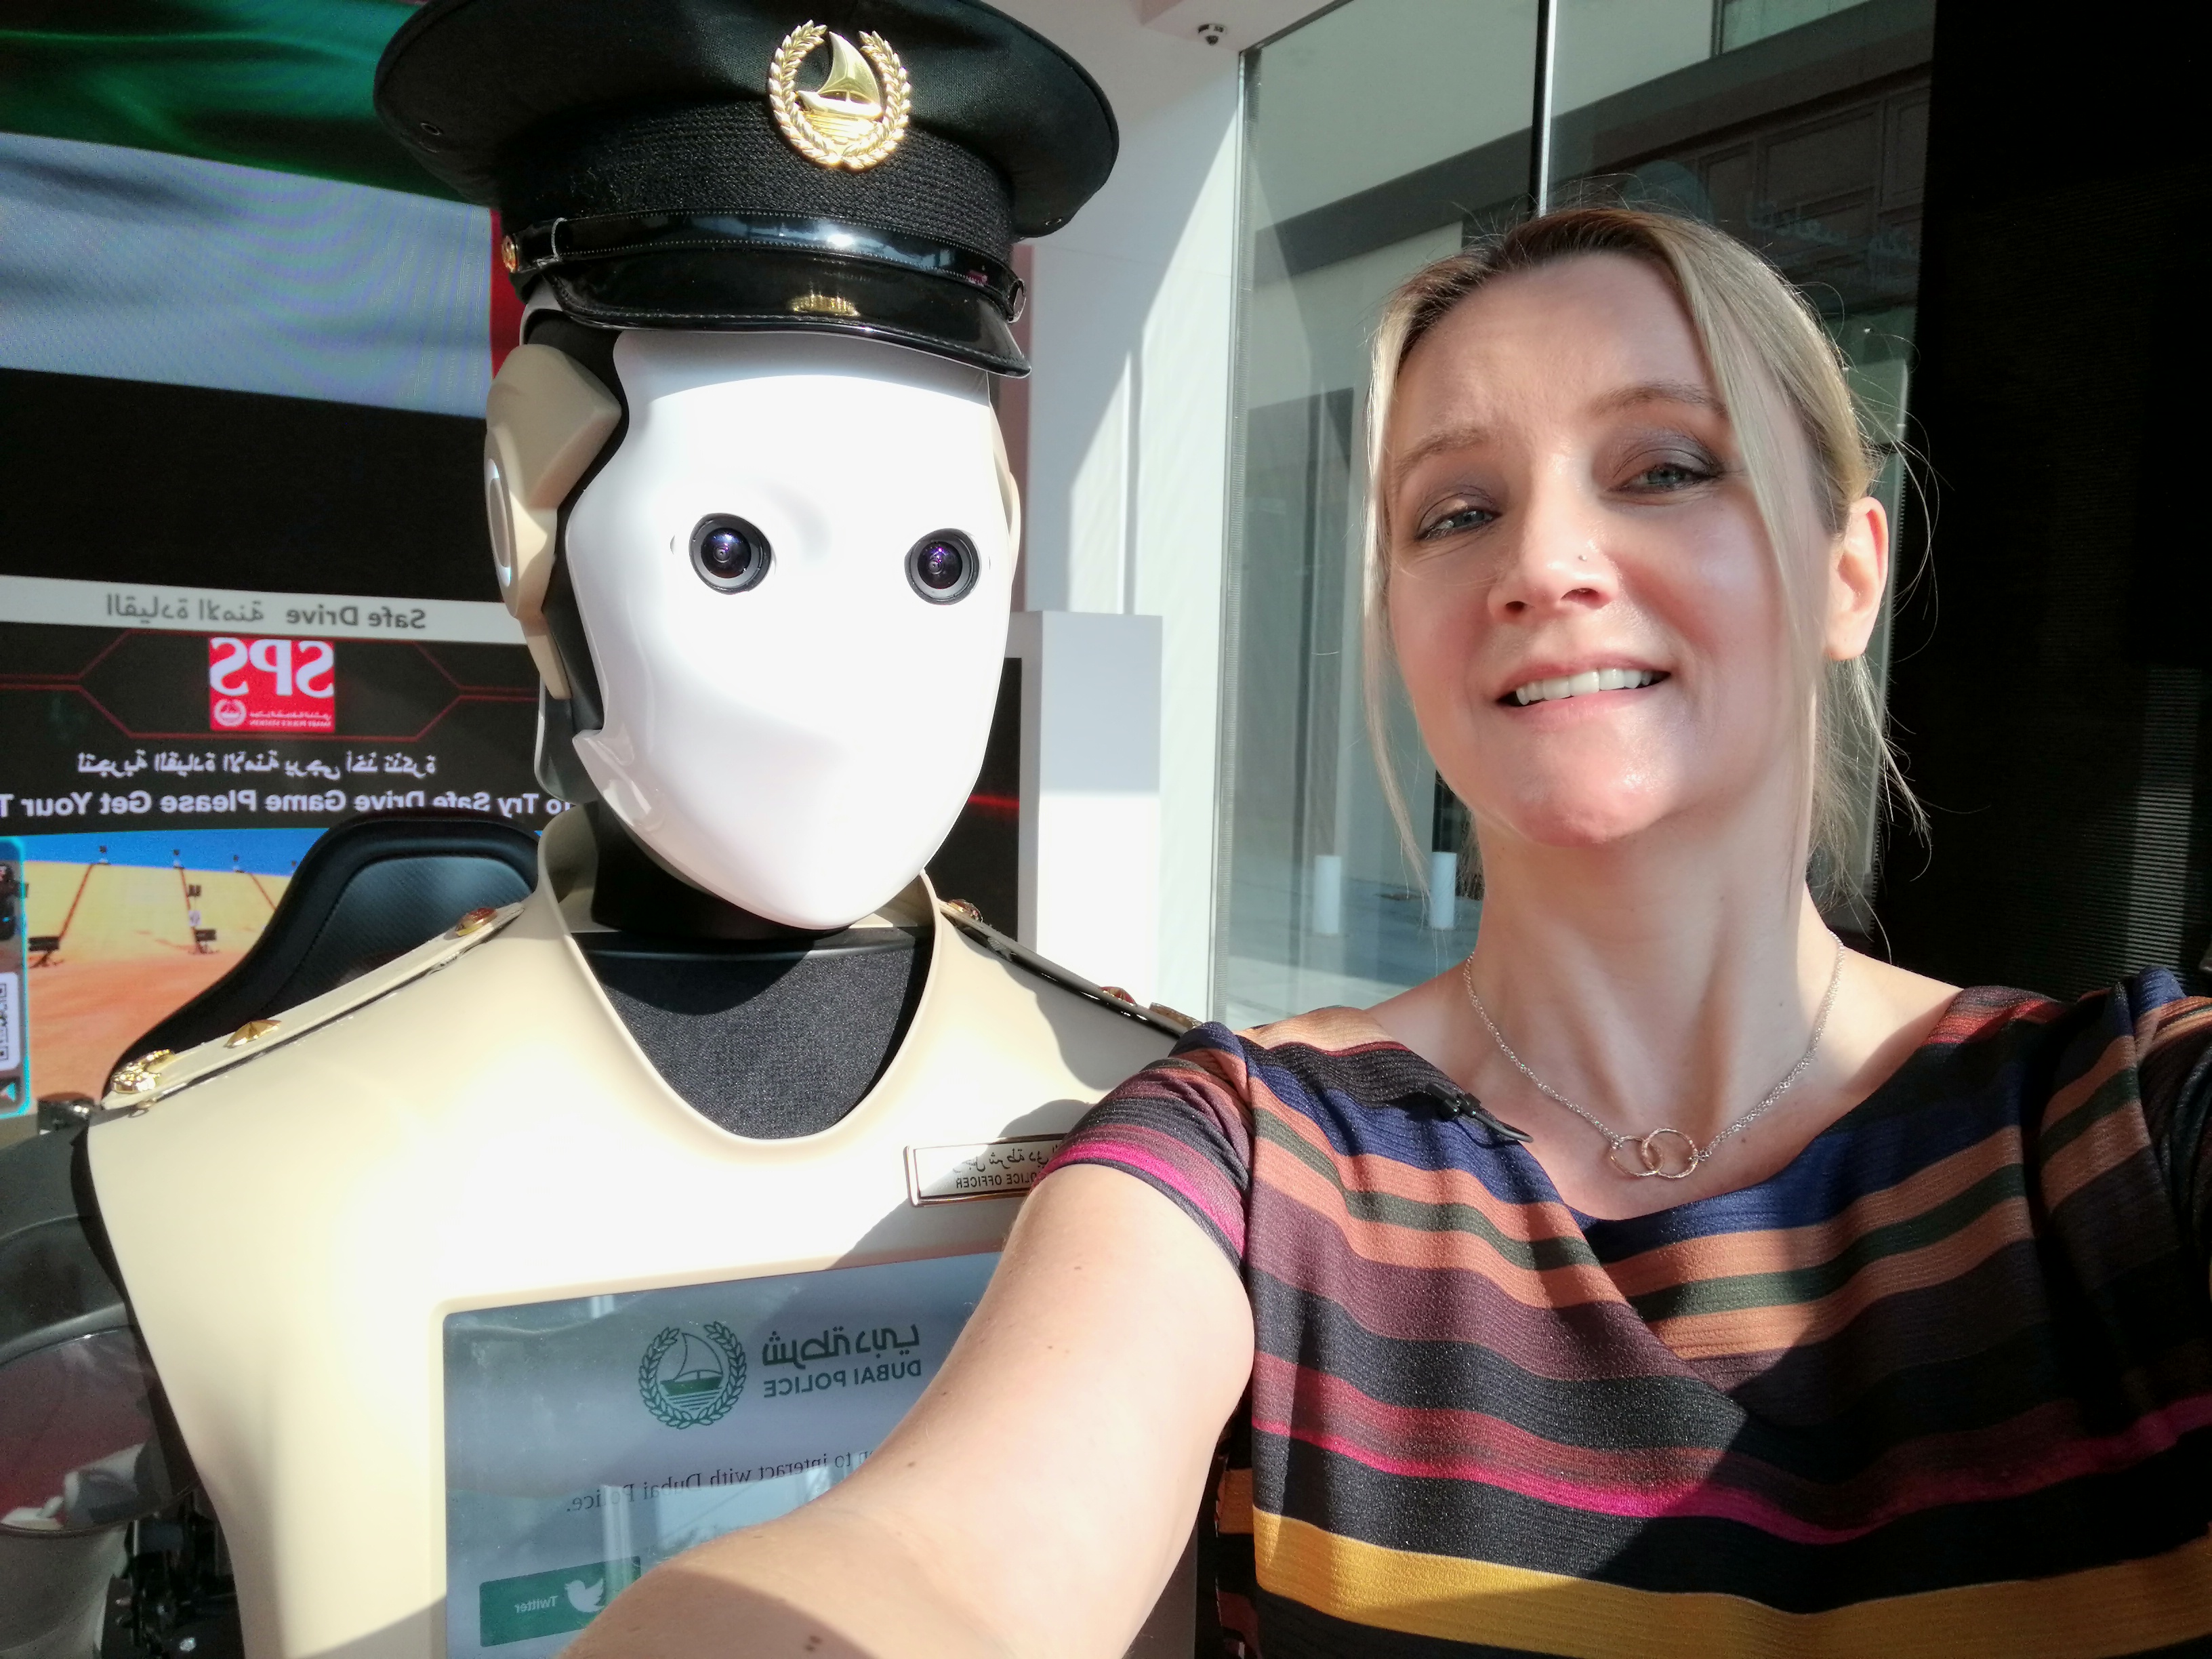 The real life Robocop patrolling Dubai